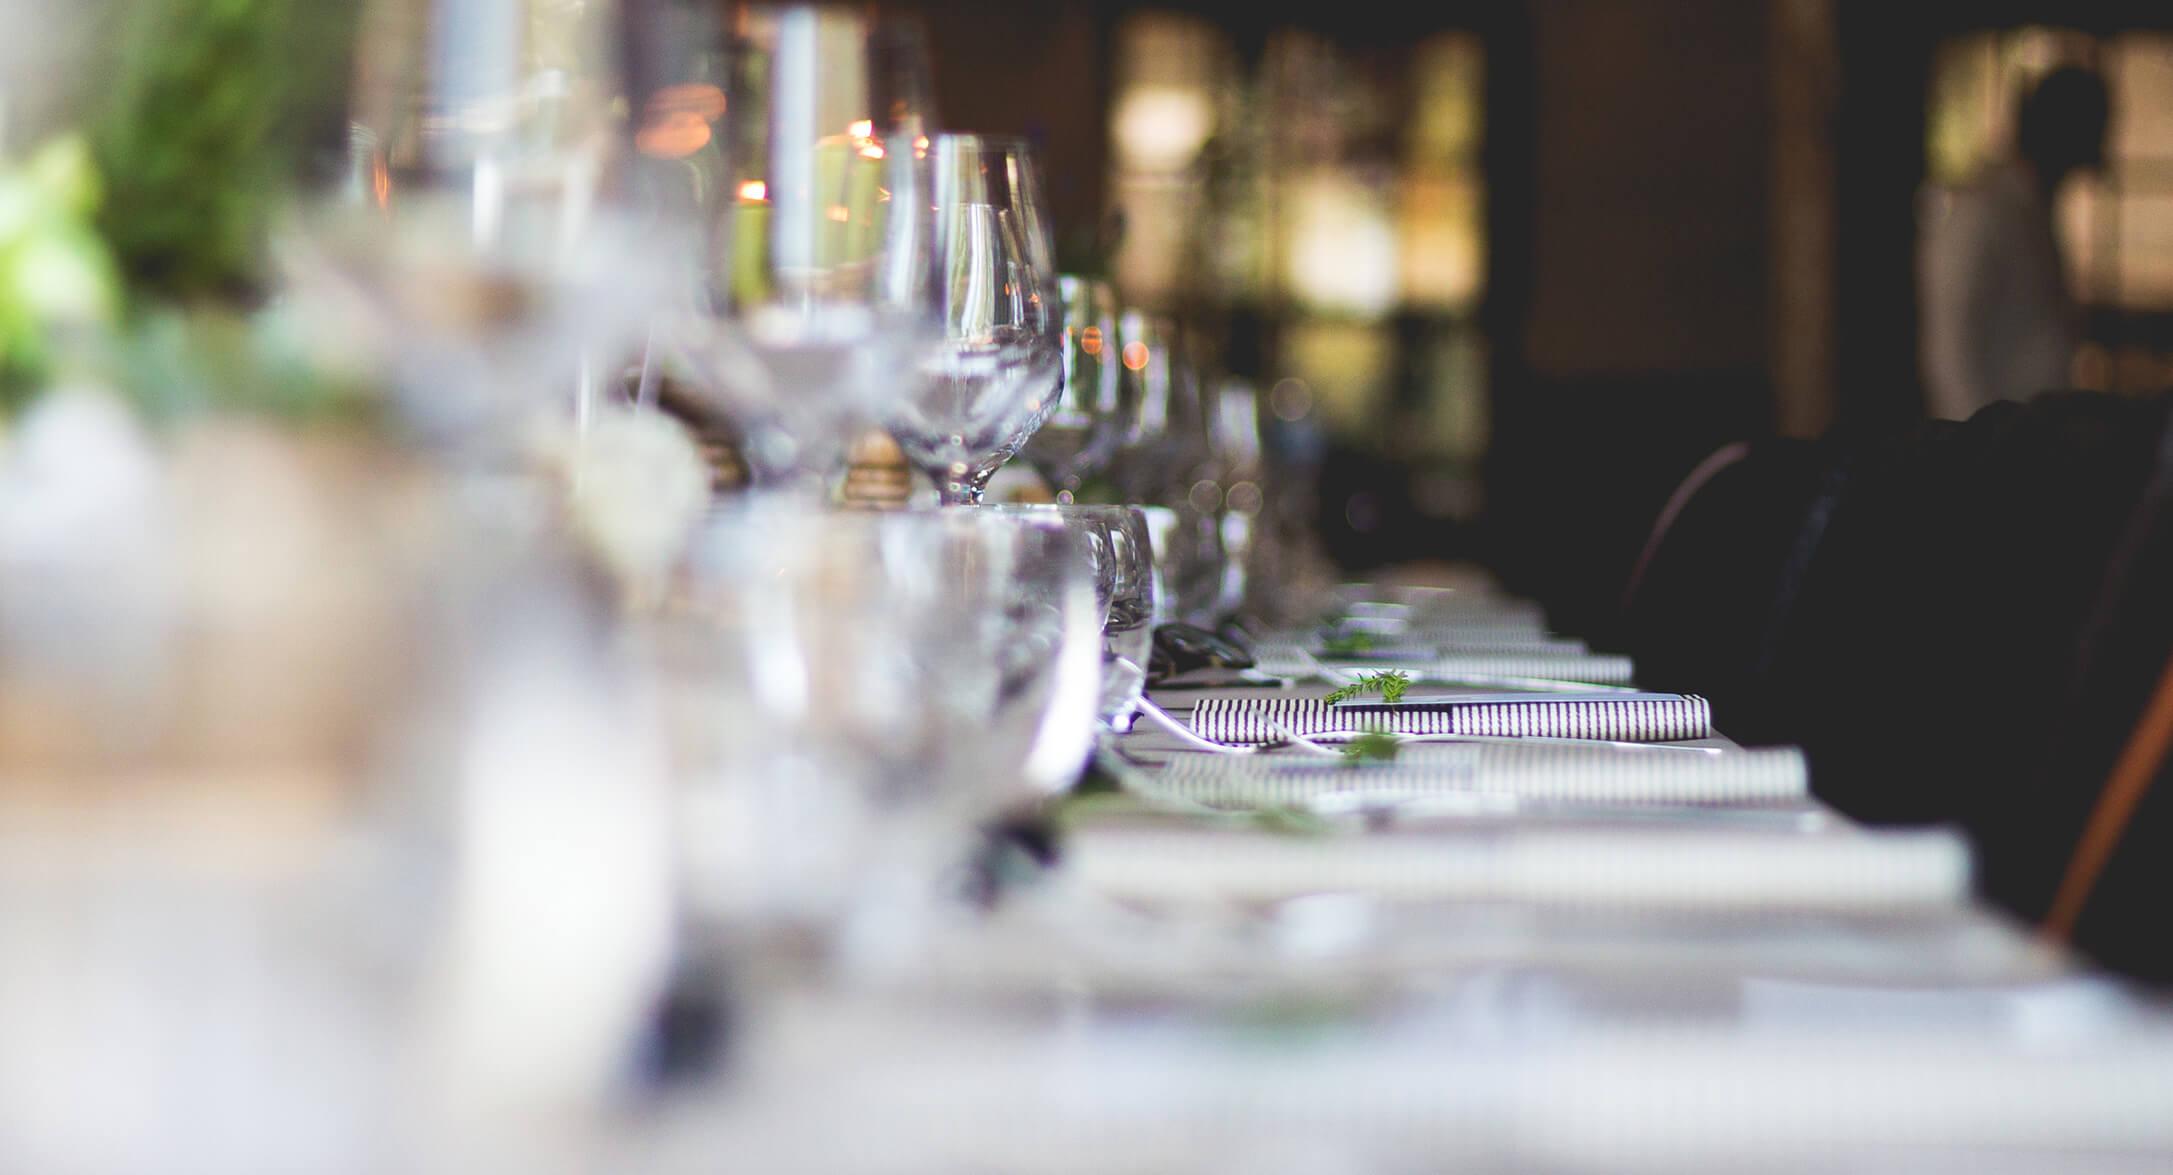 gehobene Gastronomie Sterneküche